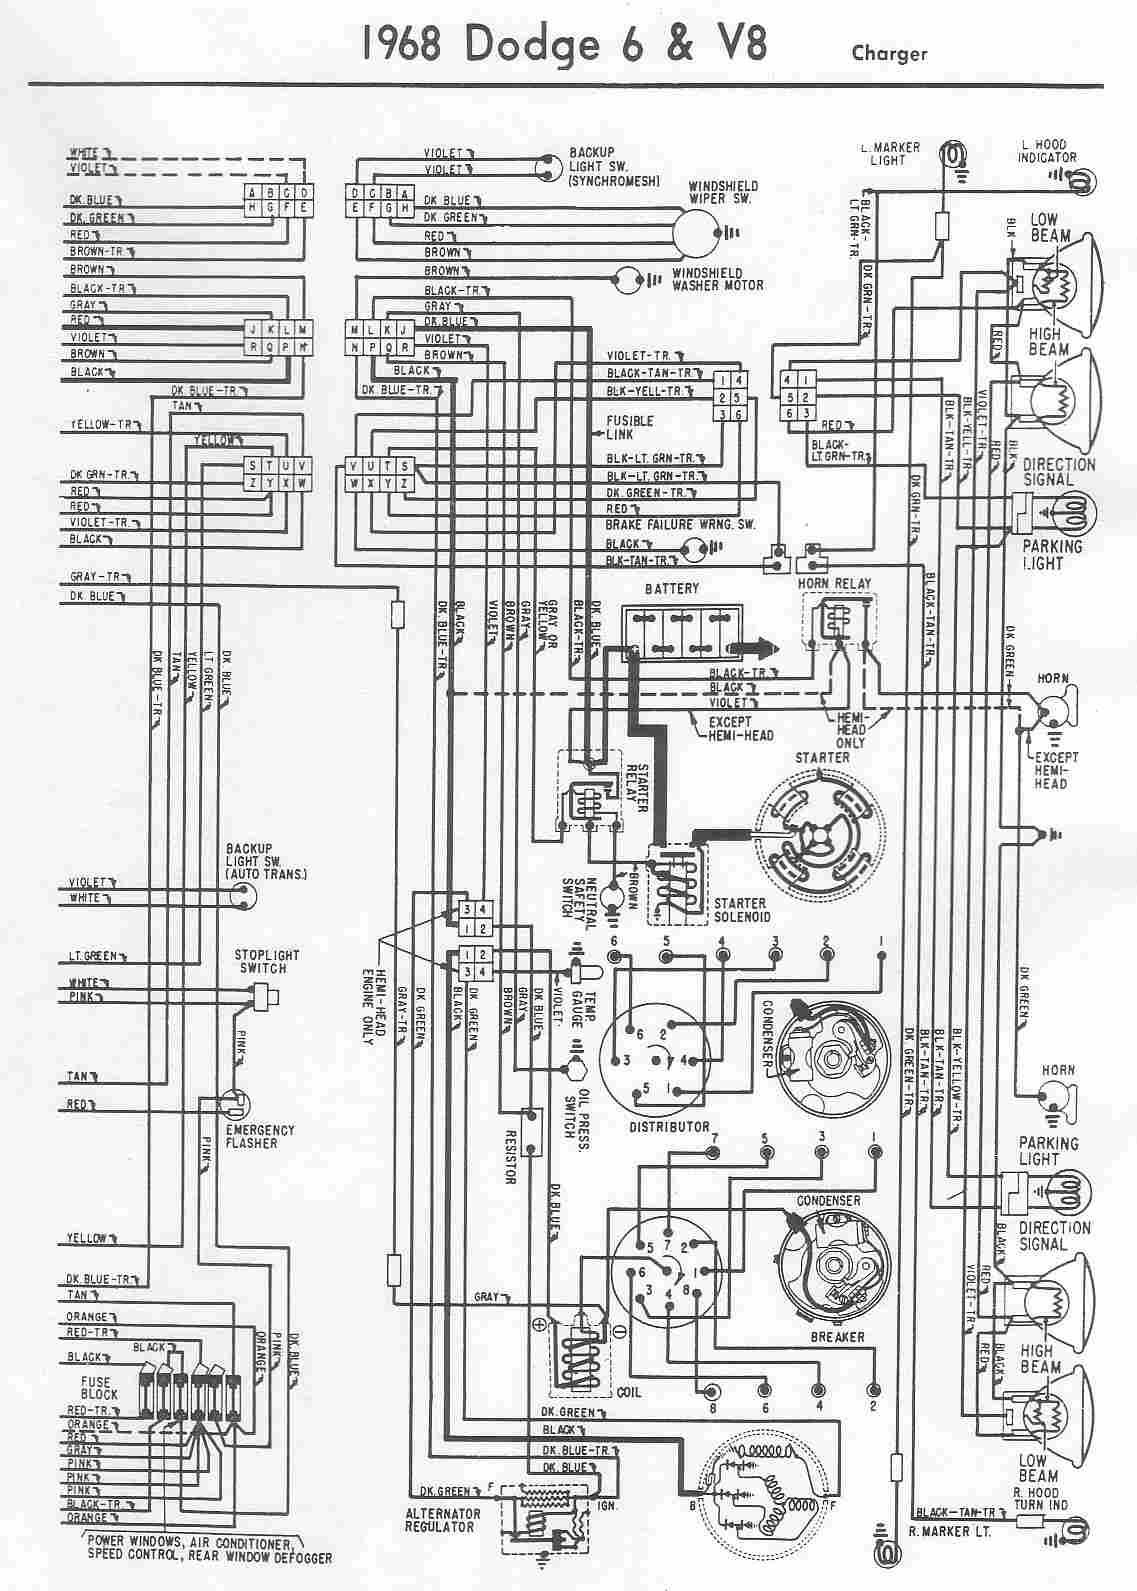 hight resolution of 2003 dodge stratus 2 7 engine diagram wiring library rh 99 mac happen de 04 dodge stratus engine diagram 2001 dodge stratus engine diagram